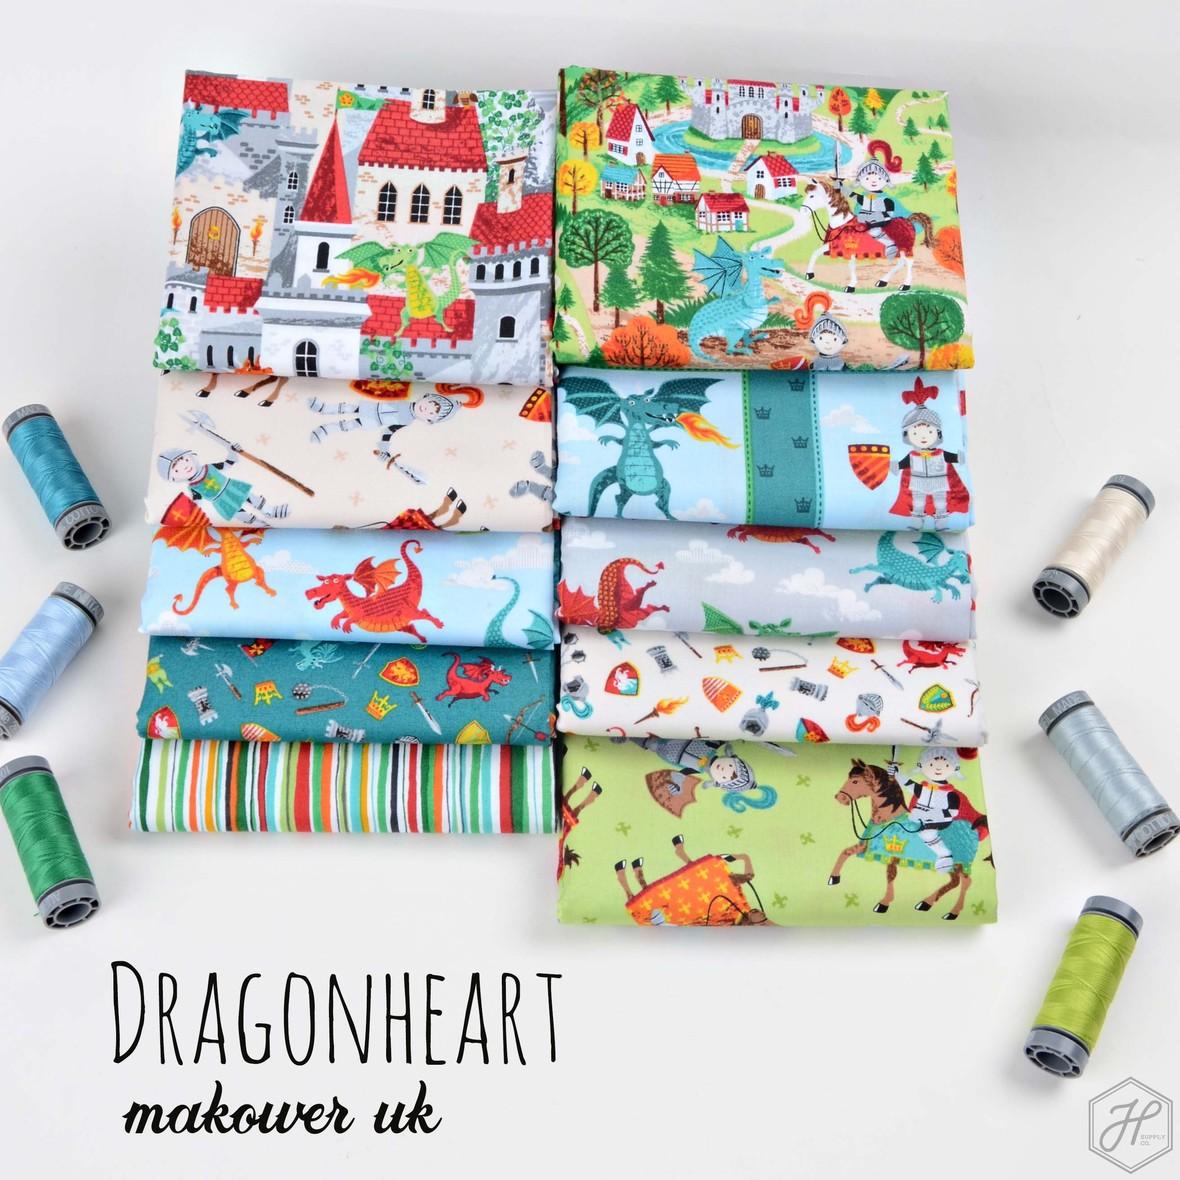 Dragonheart Fabric Poster Makower UK at Hawthorne Supply Co